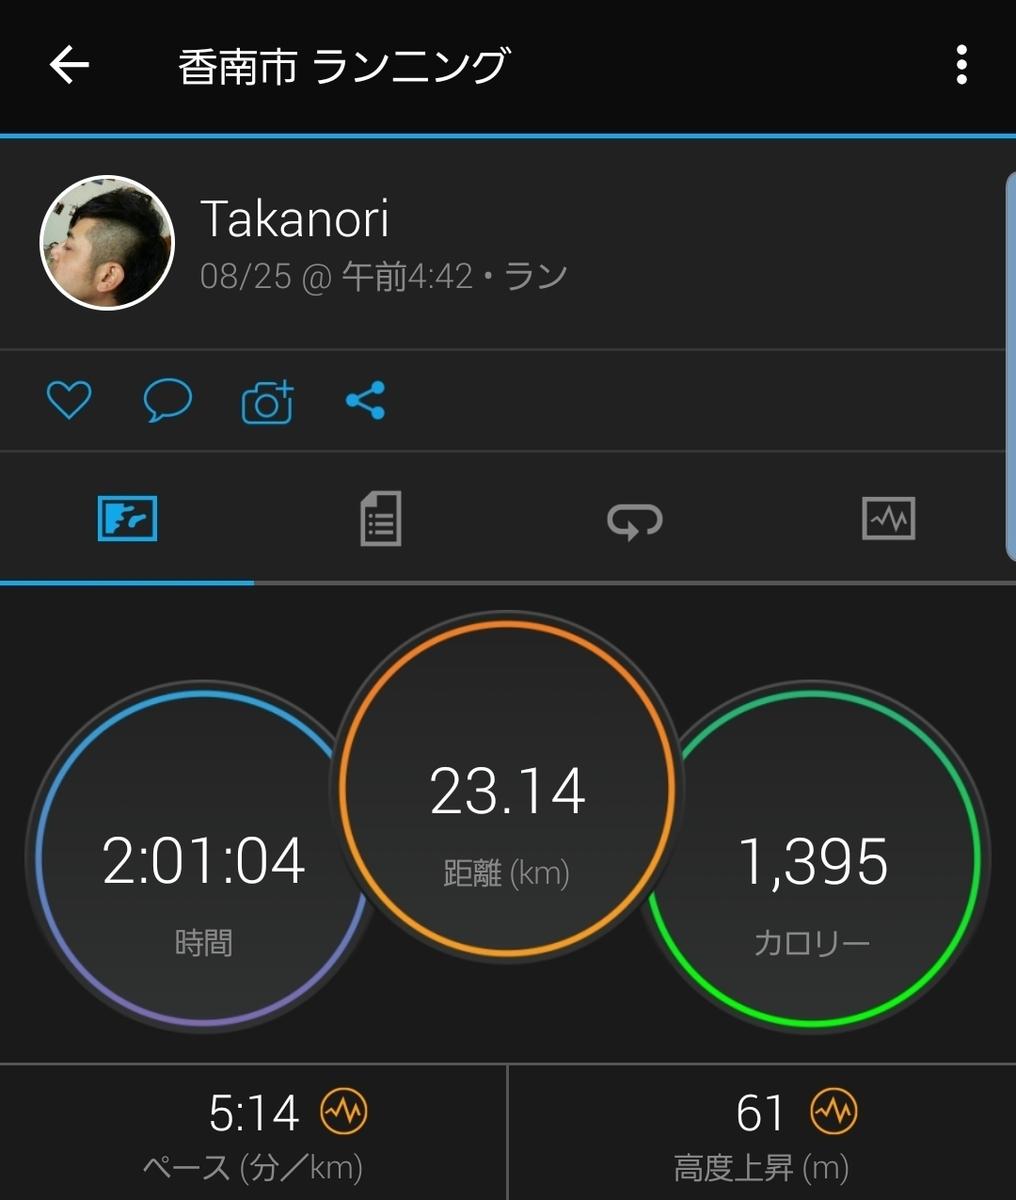 f:id:harupeiyou:20190825084738j:plain